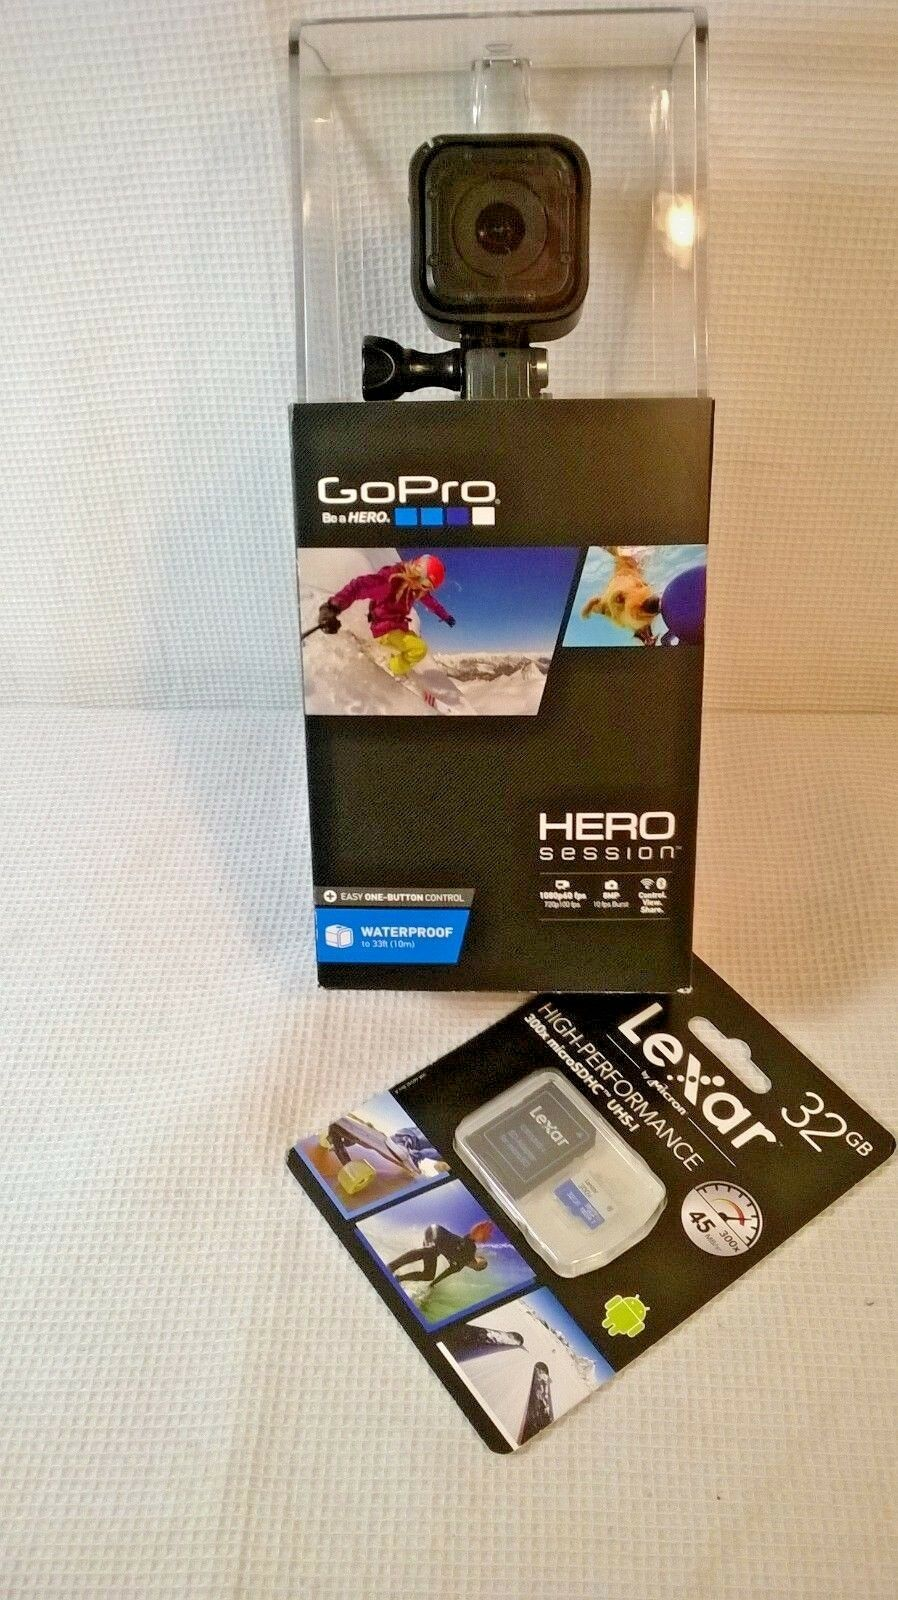 GoPro HERO Session Waterproof HD Action Camera, *Plus BONUS 32GB SD Card - NEW